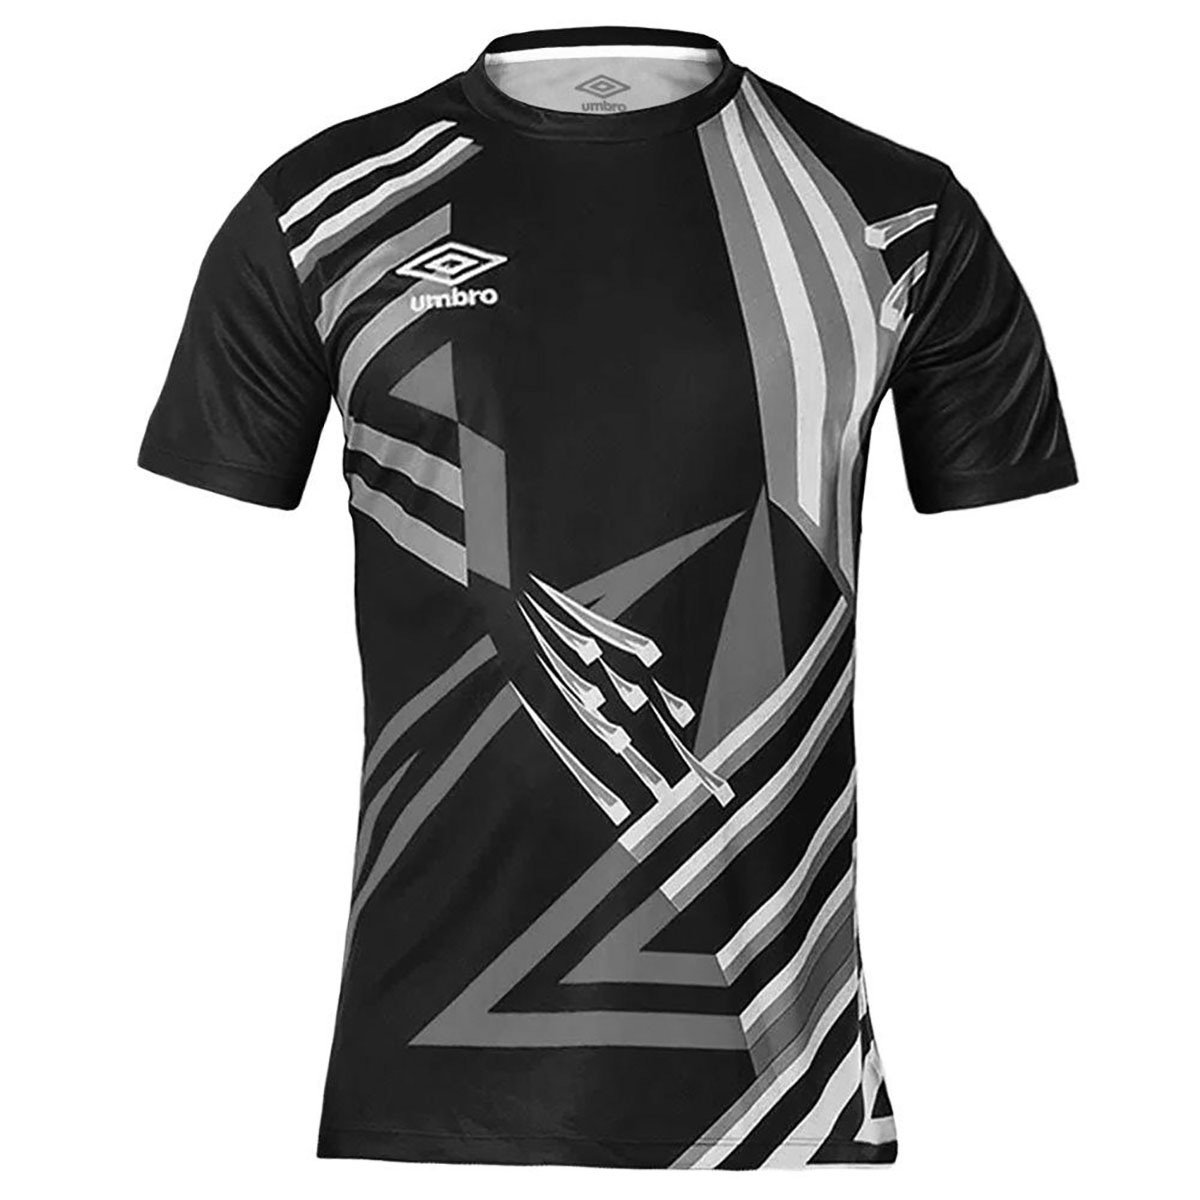 Camisa Umbro TWR Manchester 92 Masculina